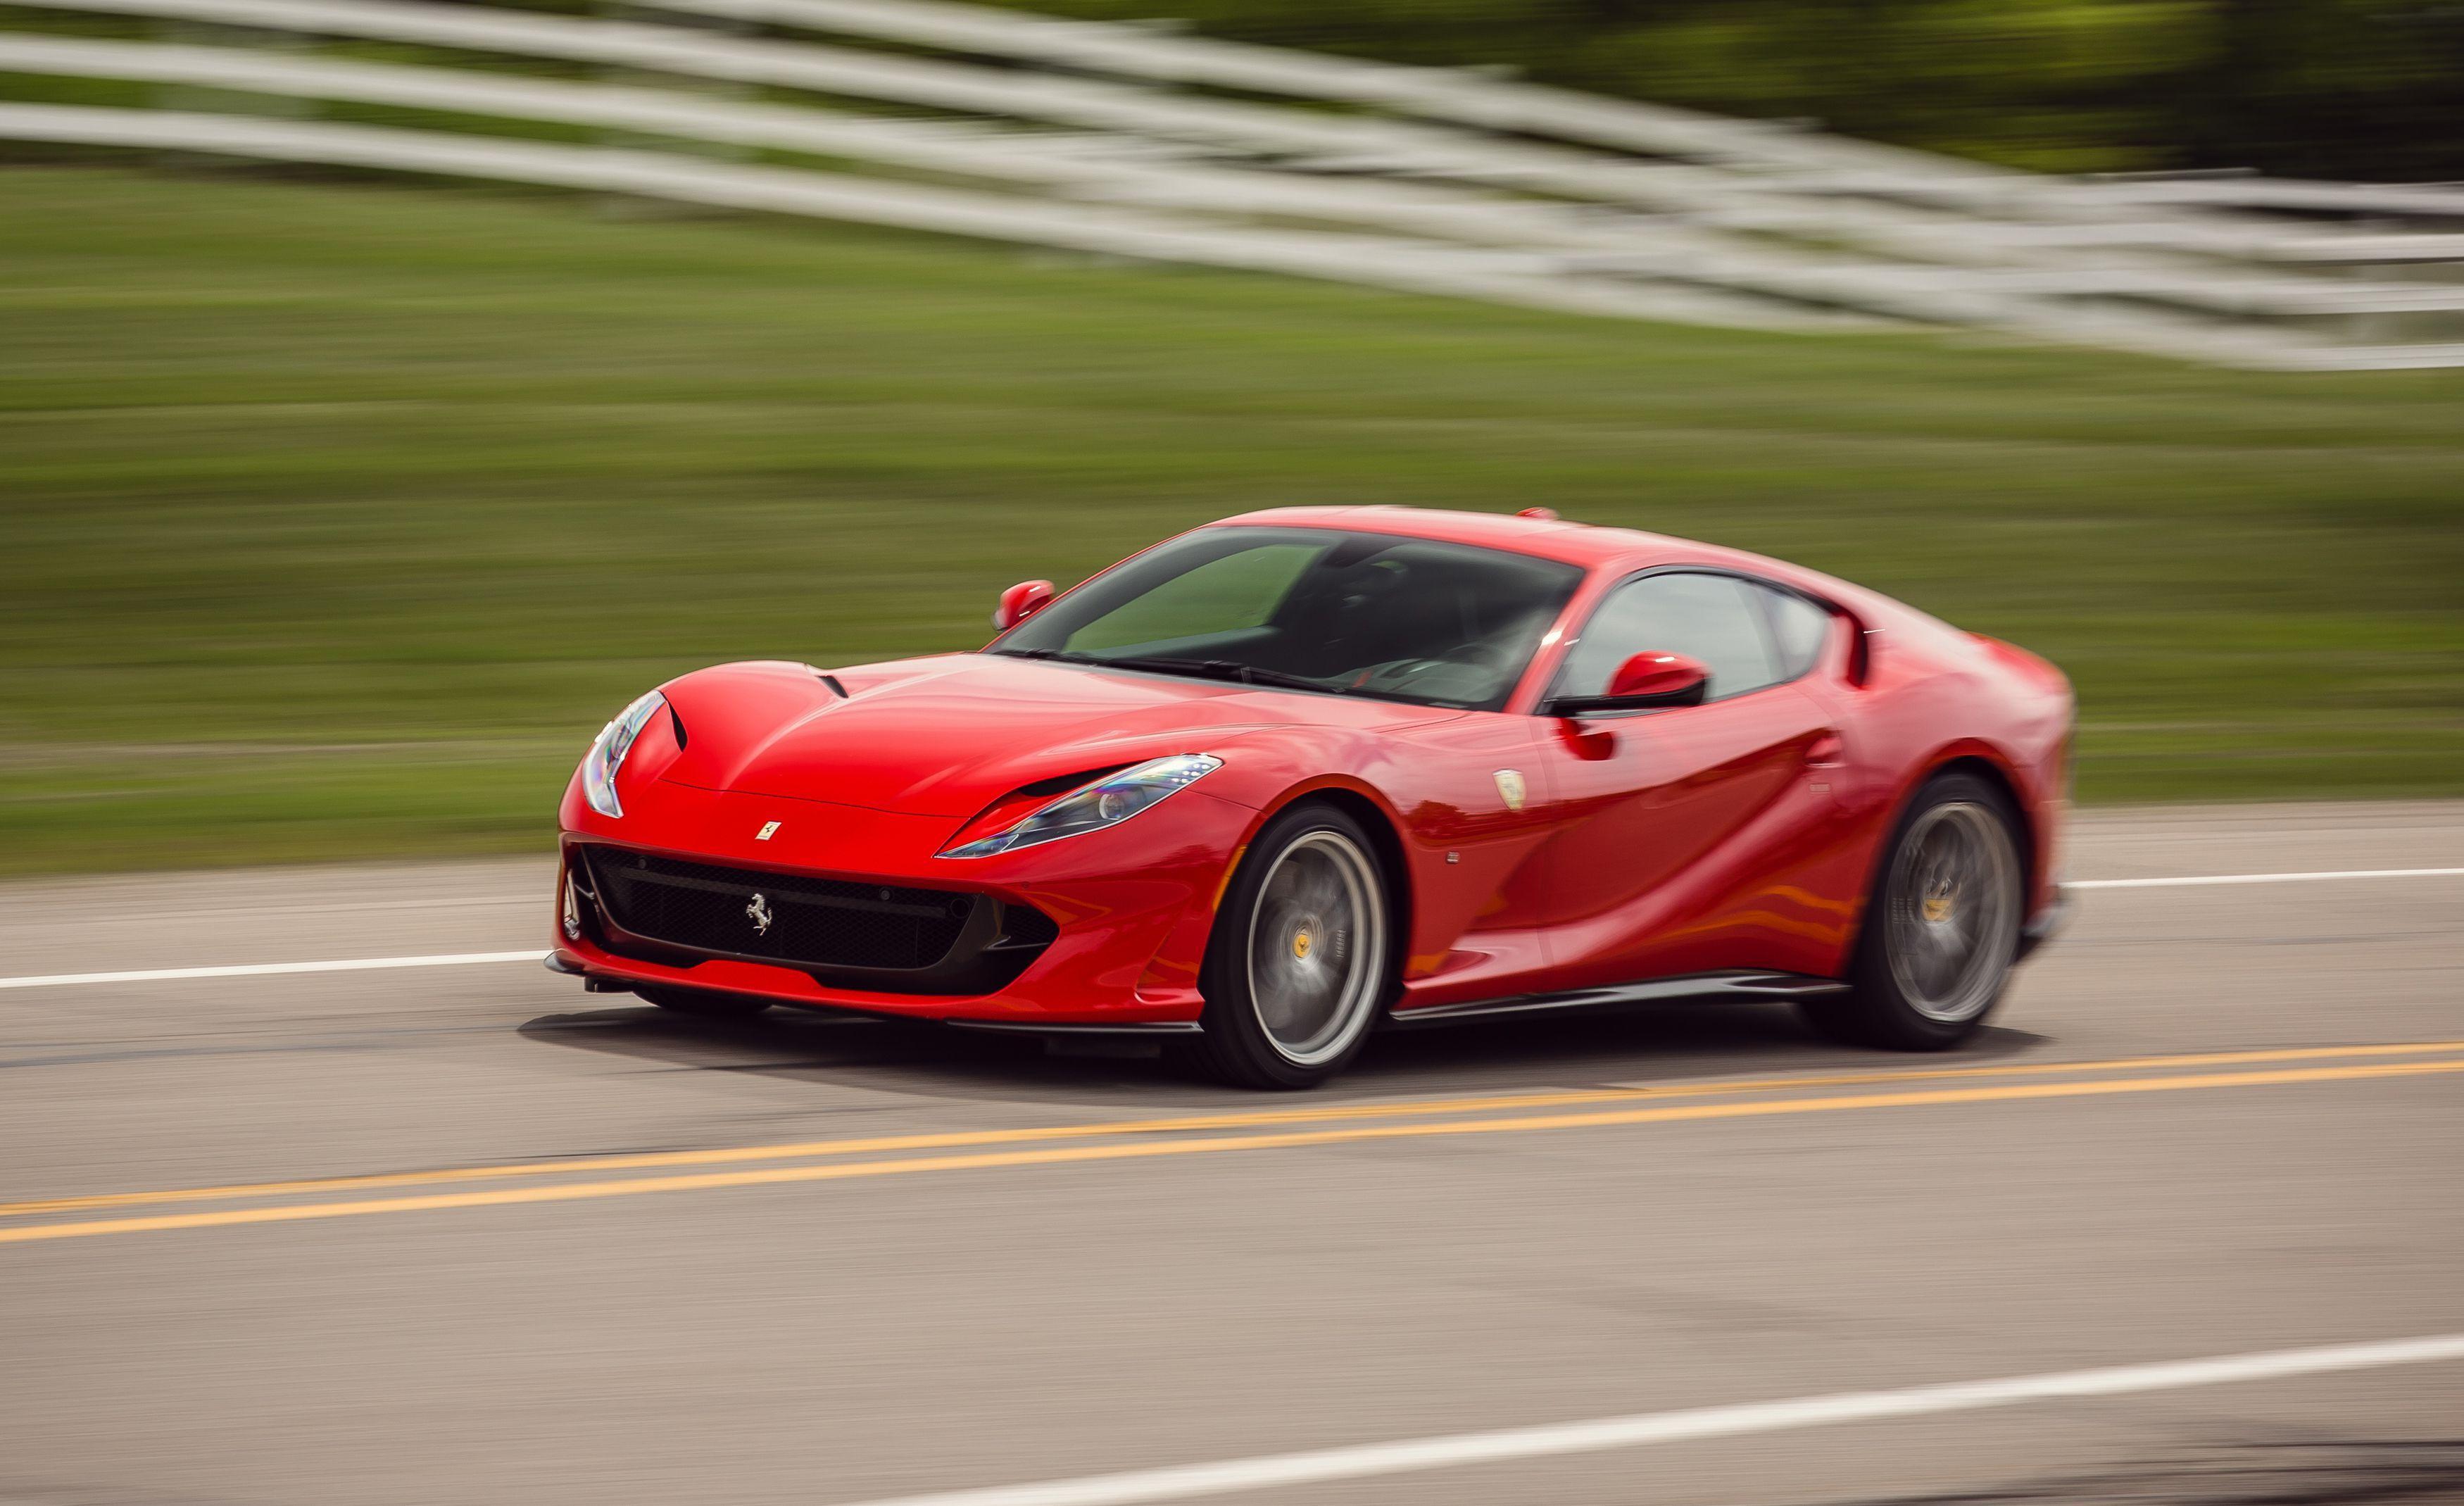 New Ferrari Cars